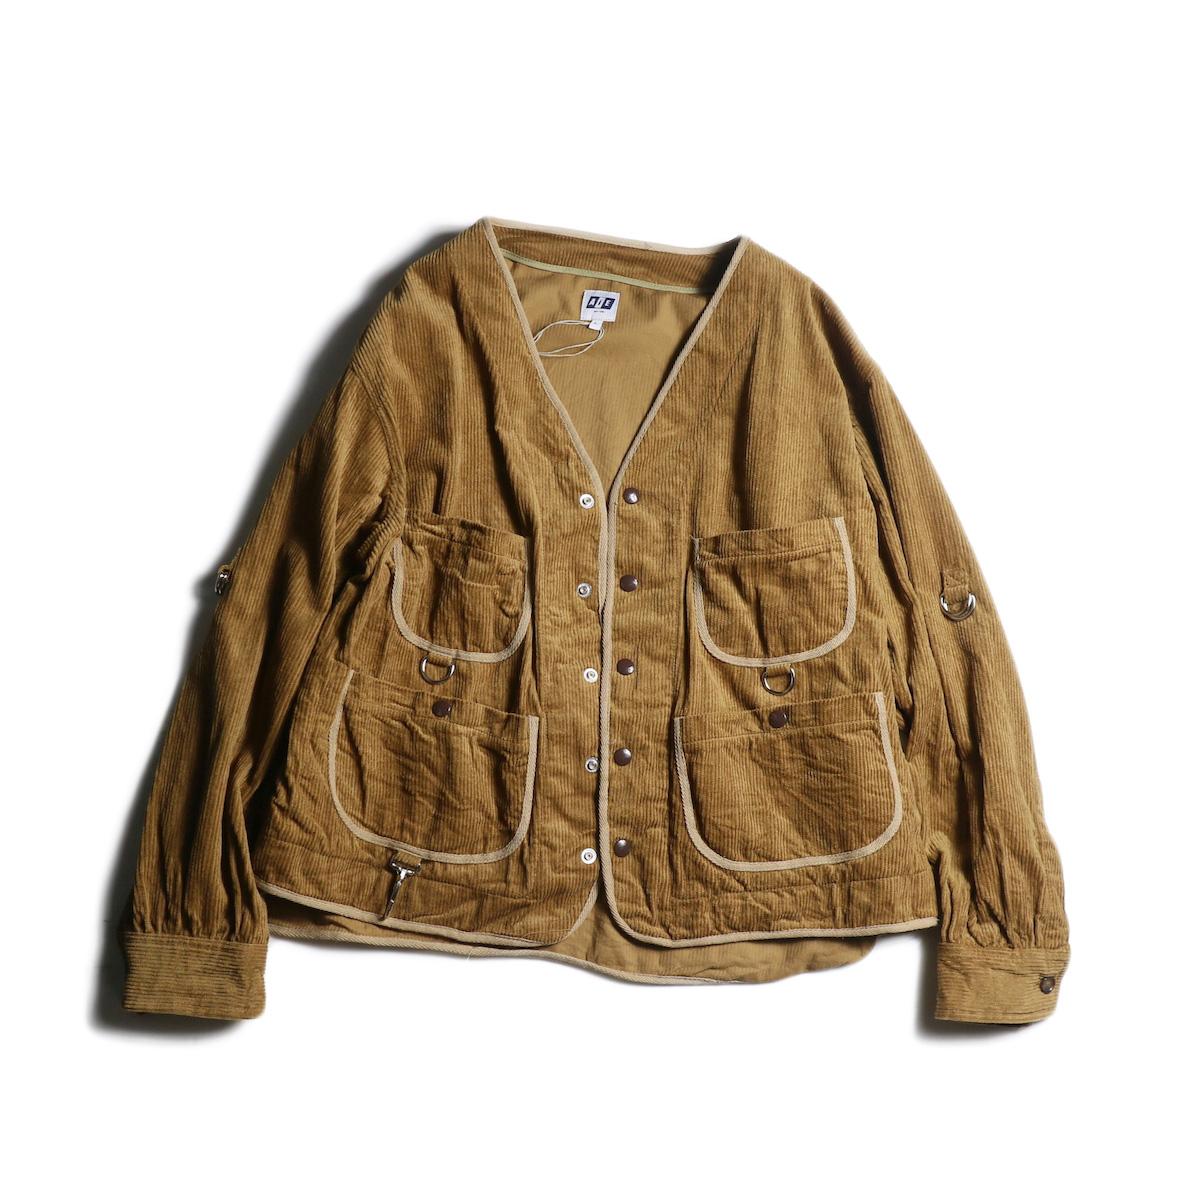 AiE / WRD Jacket -8W Corduroy (Chestnut)